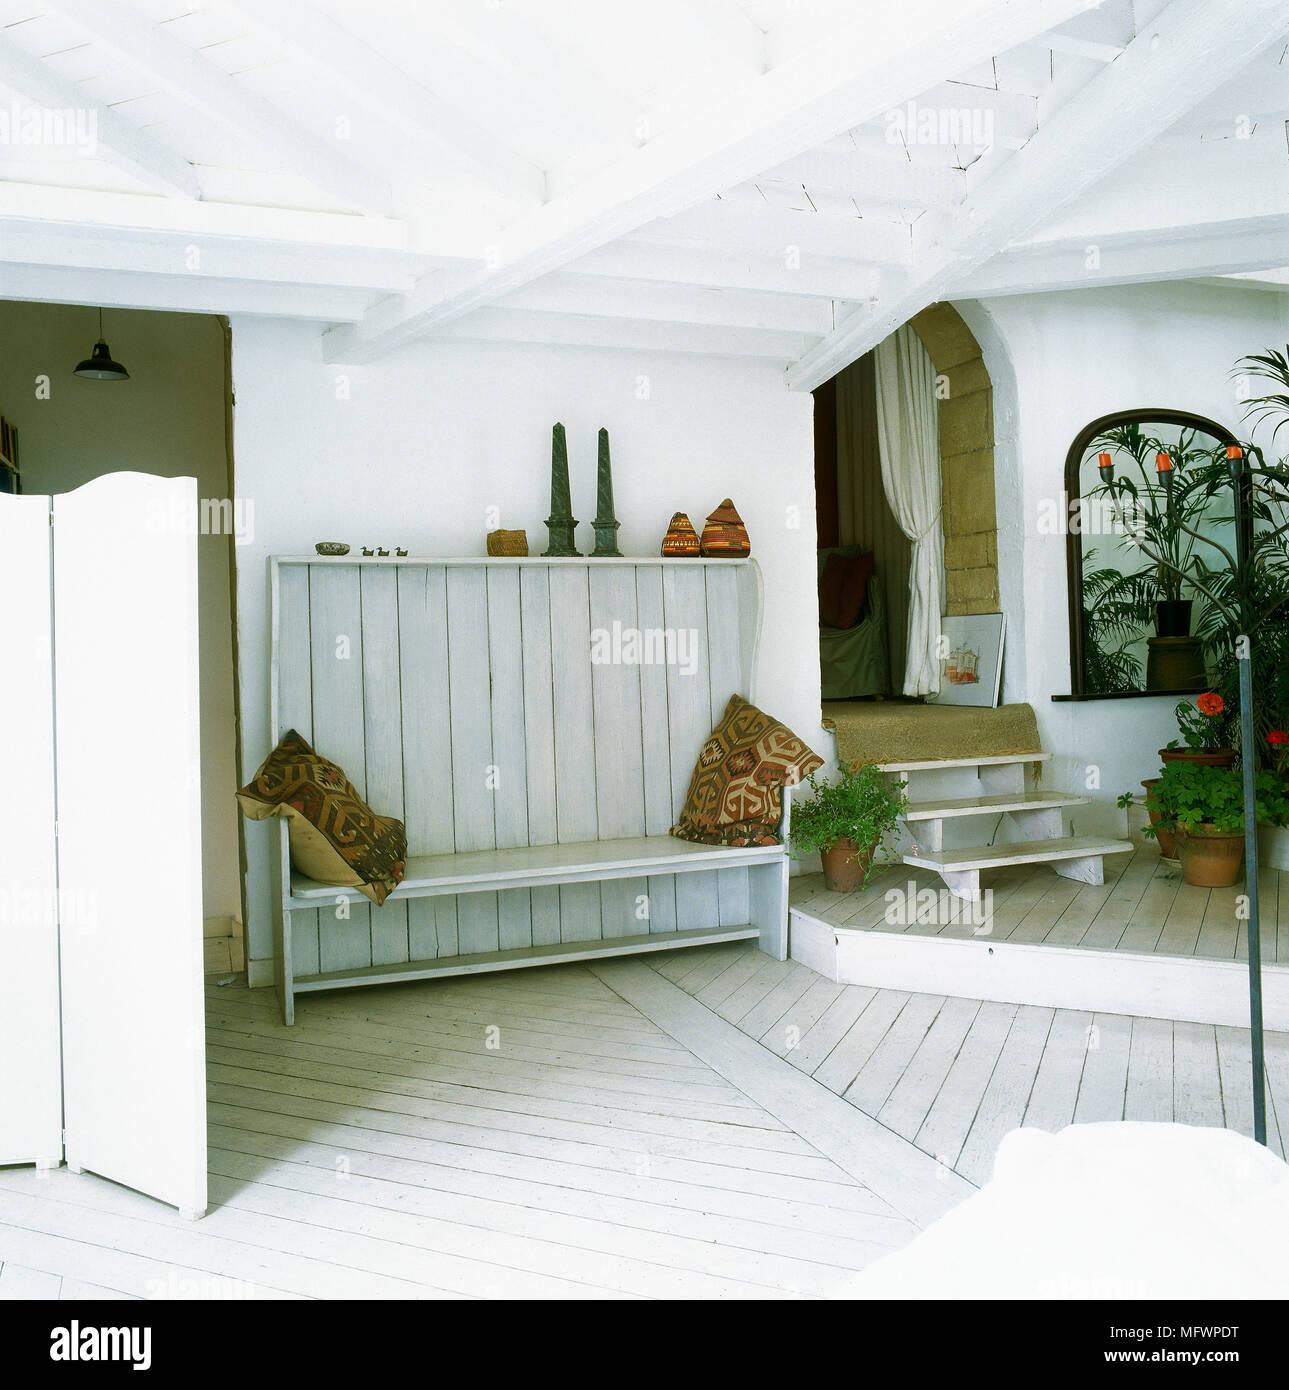 Soffitto Travi A Vista Bianco paese bianco corridoio con soffitto con travi a vista e